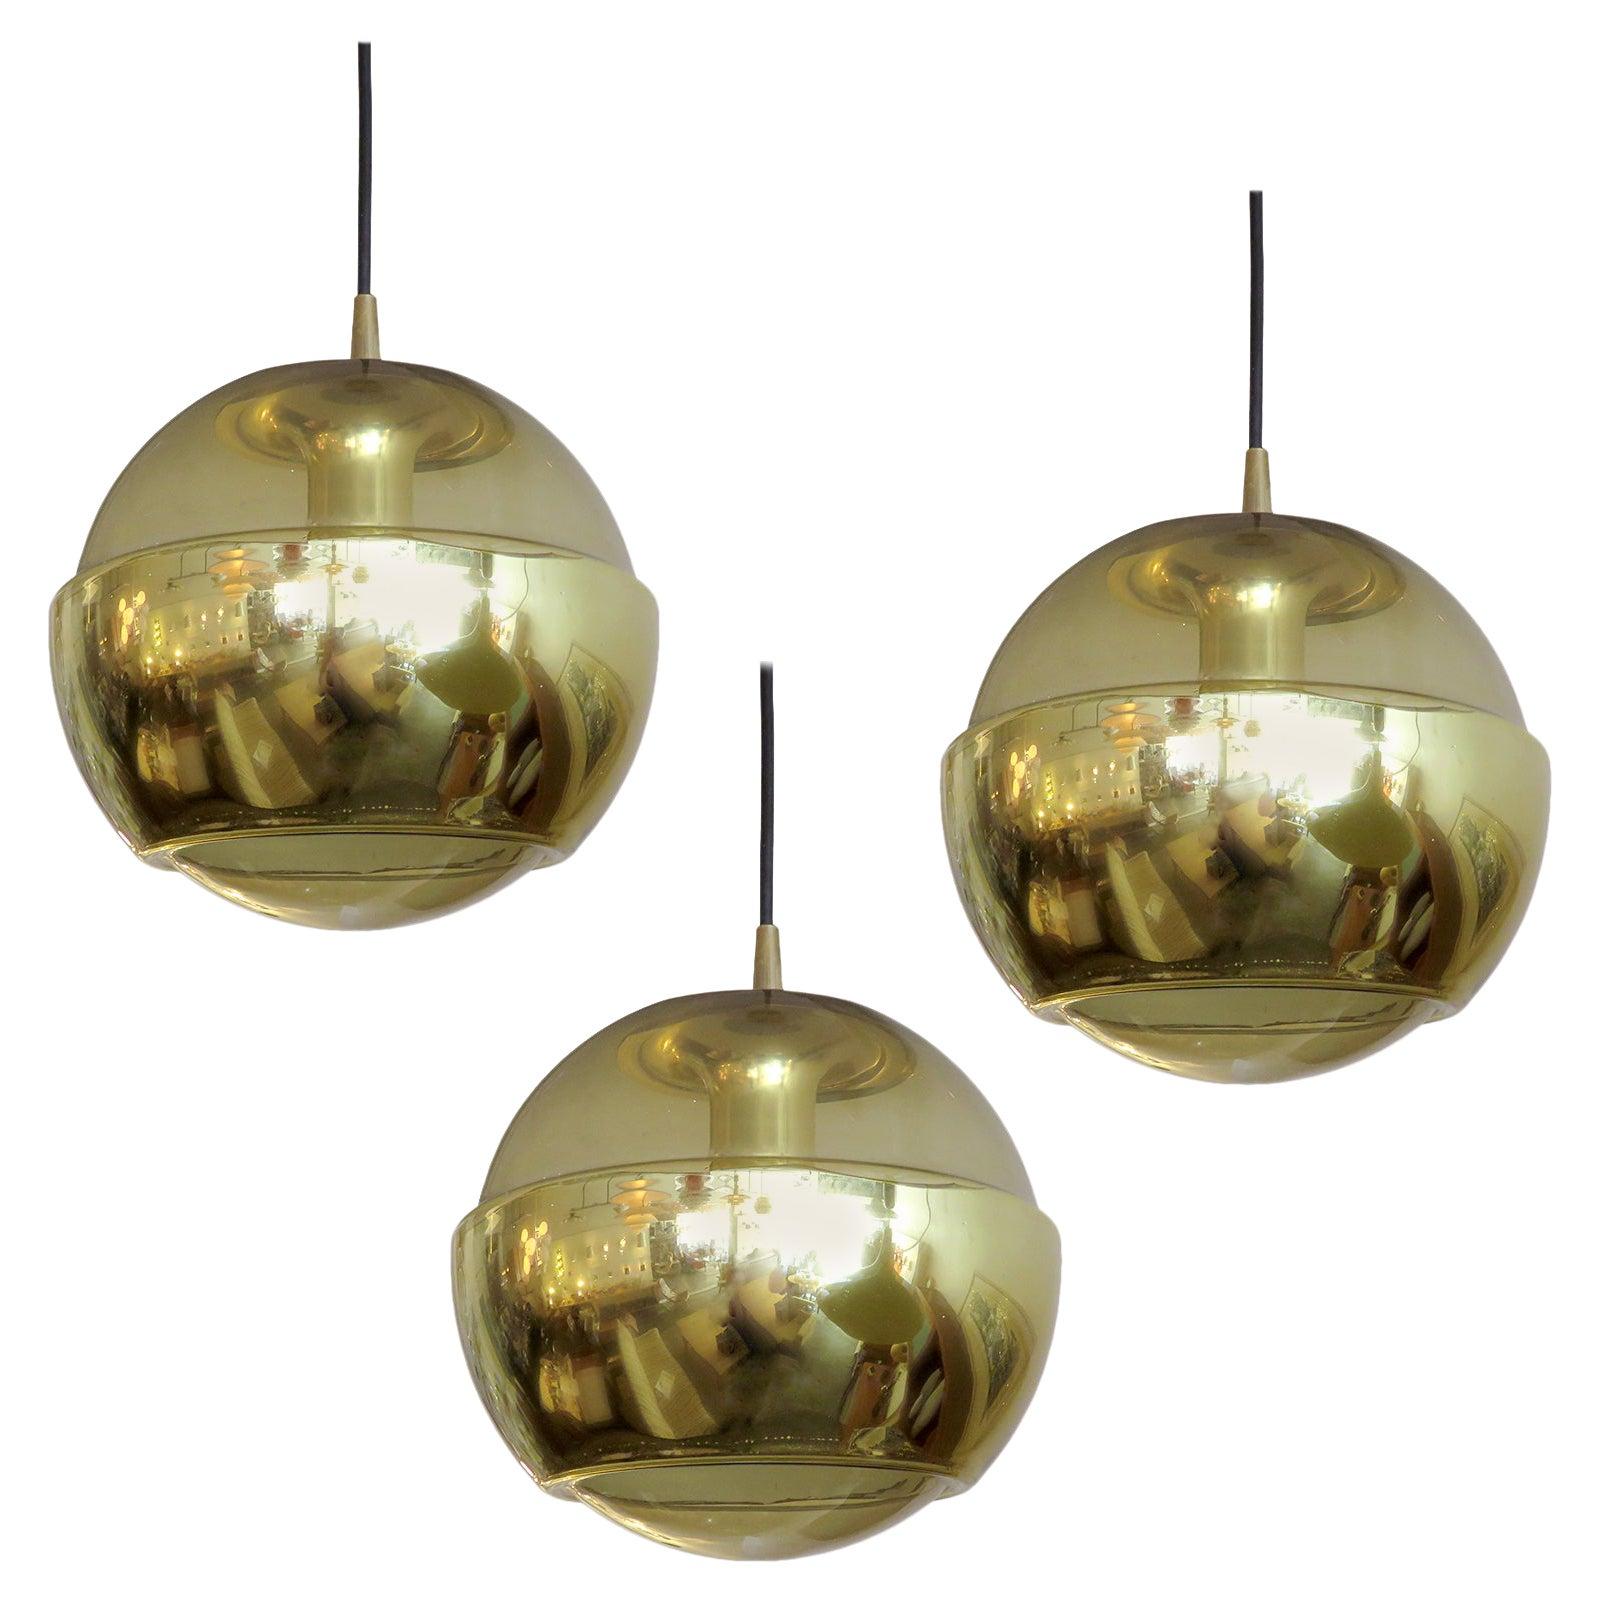 Set of Three Smoked Glass Hanging Lights, 1970